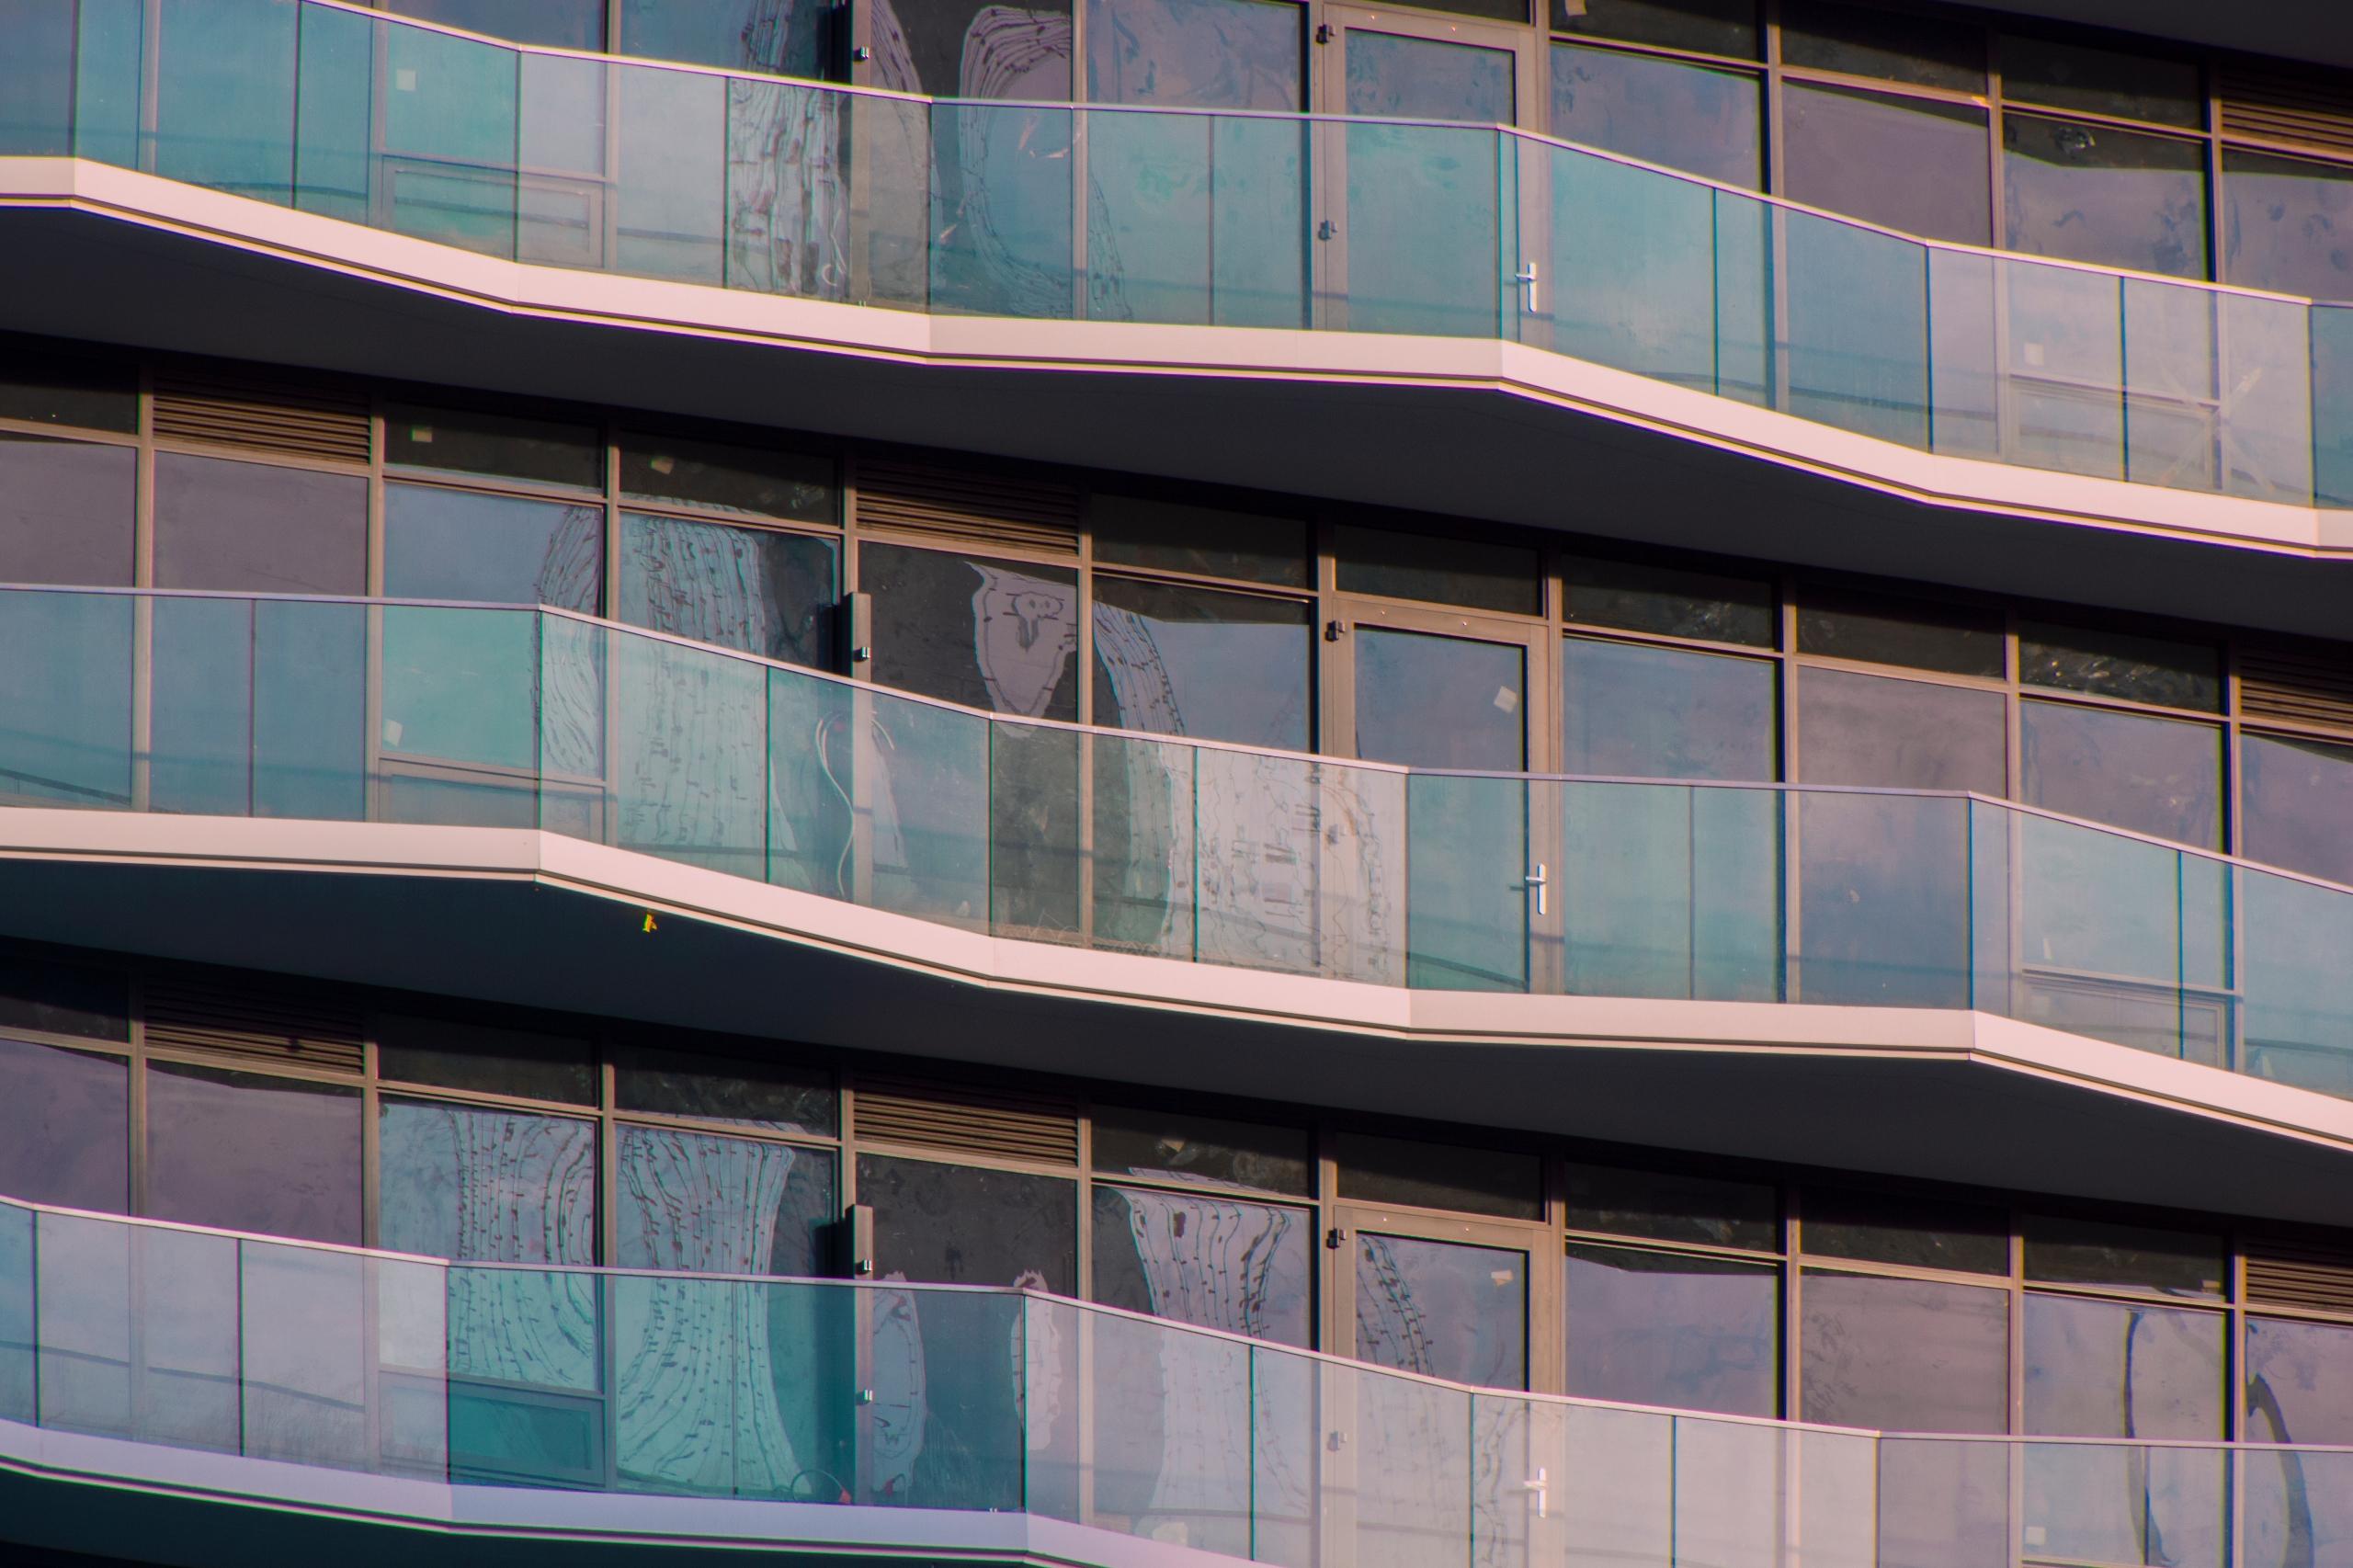 glass - architecture, minimal, geometric - kylie_hazzard_visuals   ello